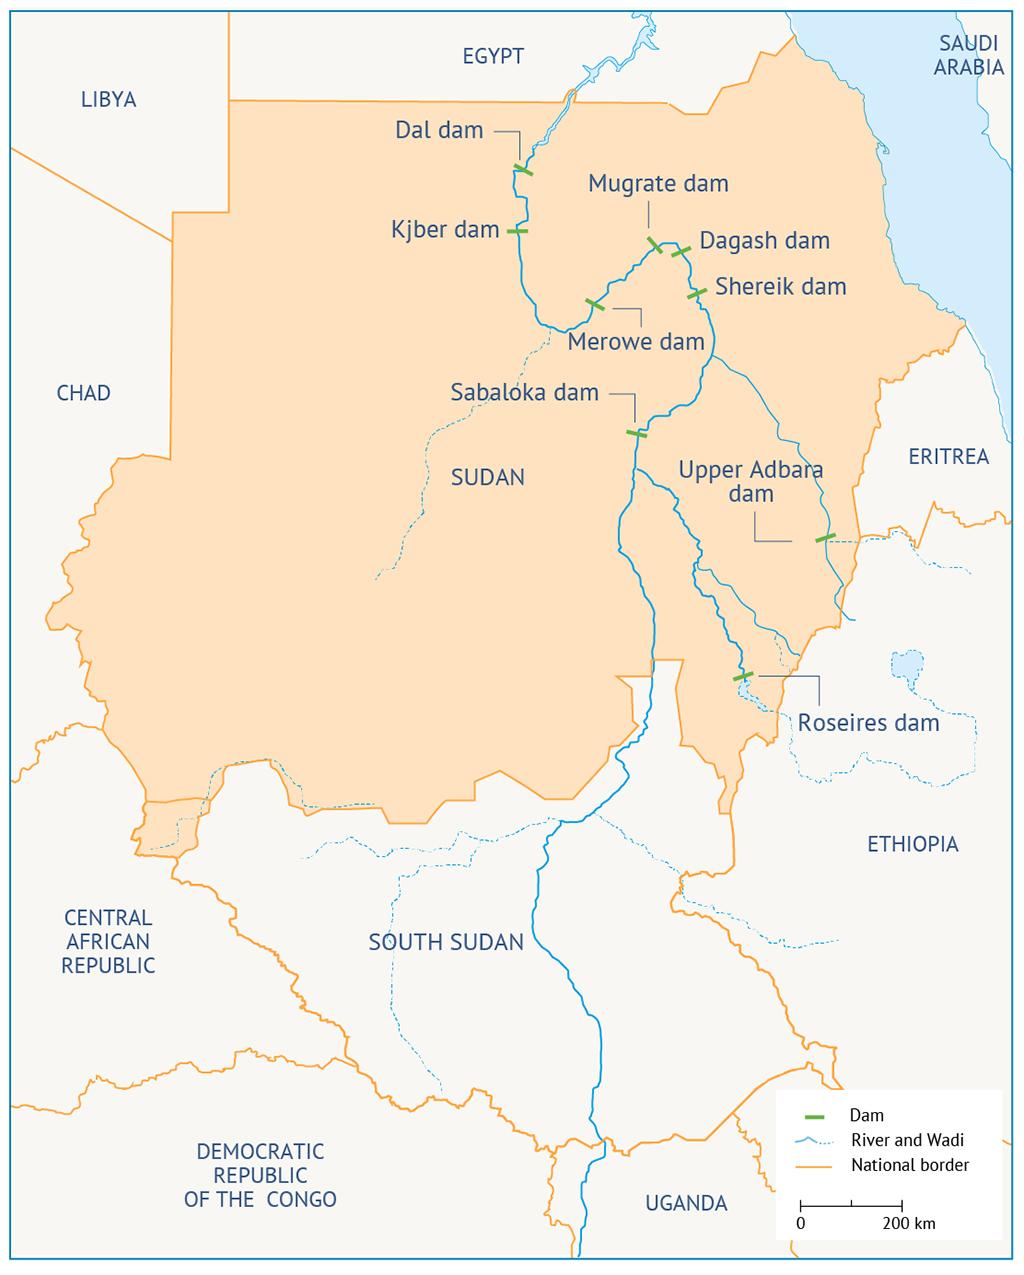 Map 1: Location of dams on the Nile in Sudan Dam السد السدود